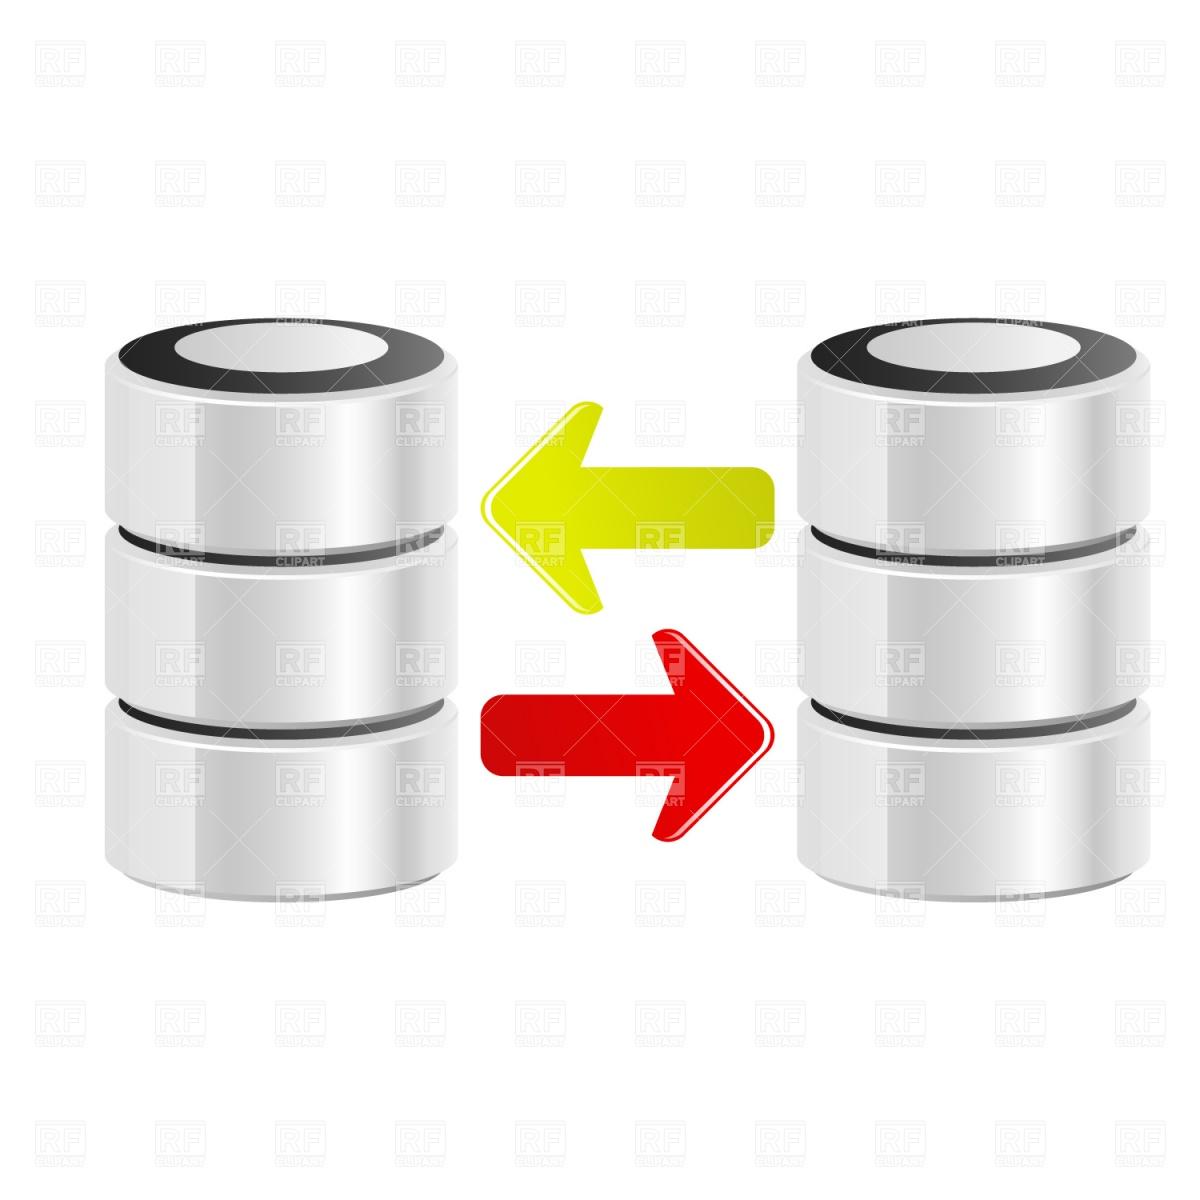 Data transfer clipart graphic black and white Data transfer clipart - ClipartFest graphic black and white